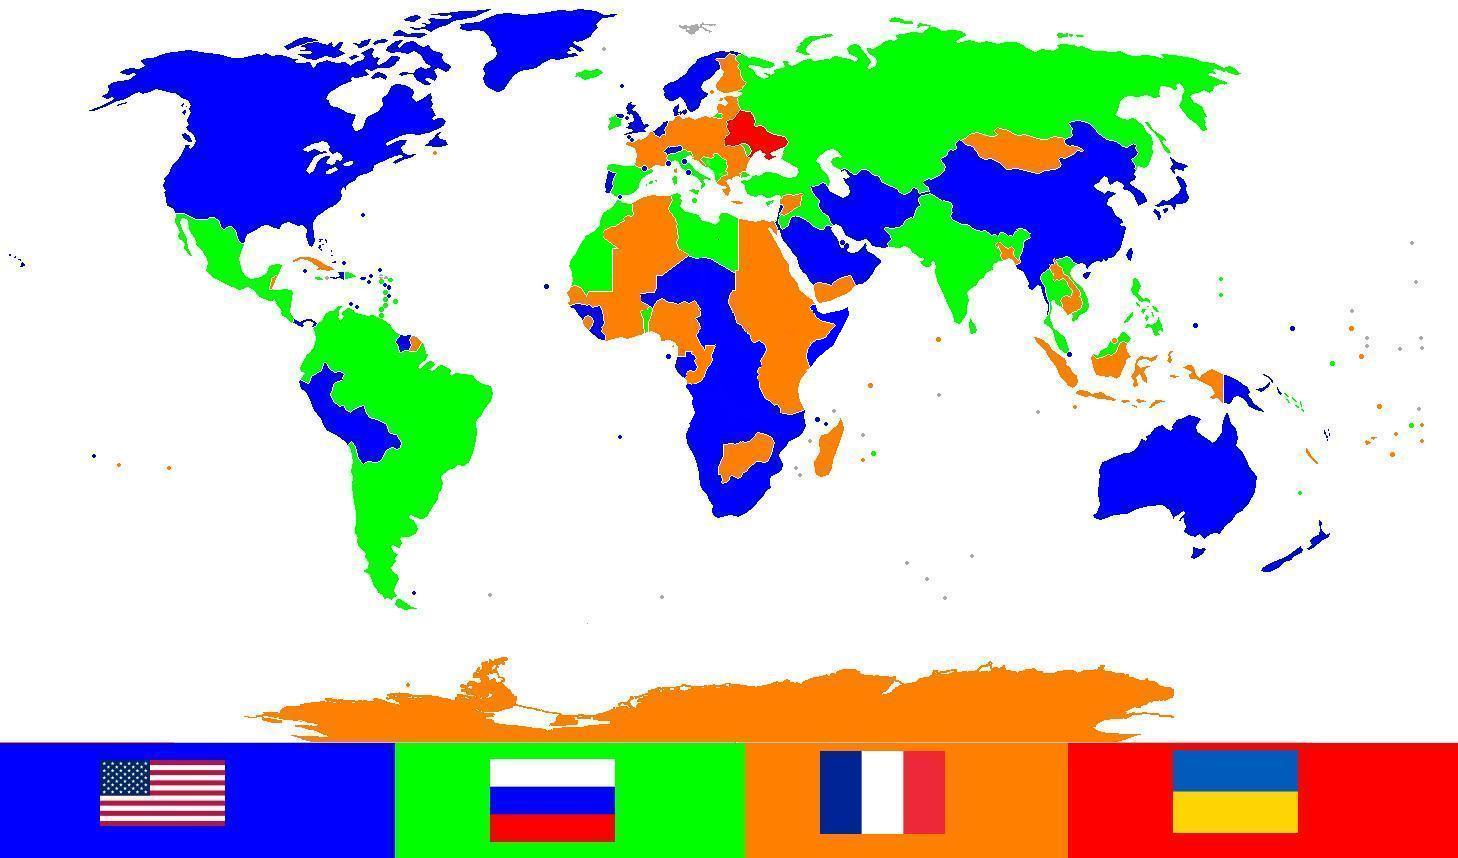 Usa Ie Russia Chrome Firefox France Opera Ukraine Jpg